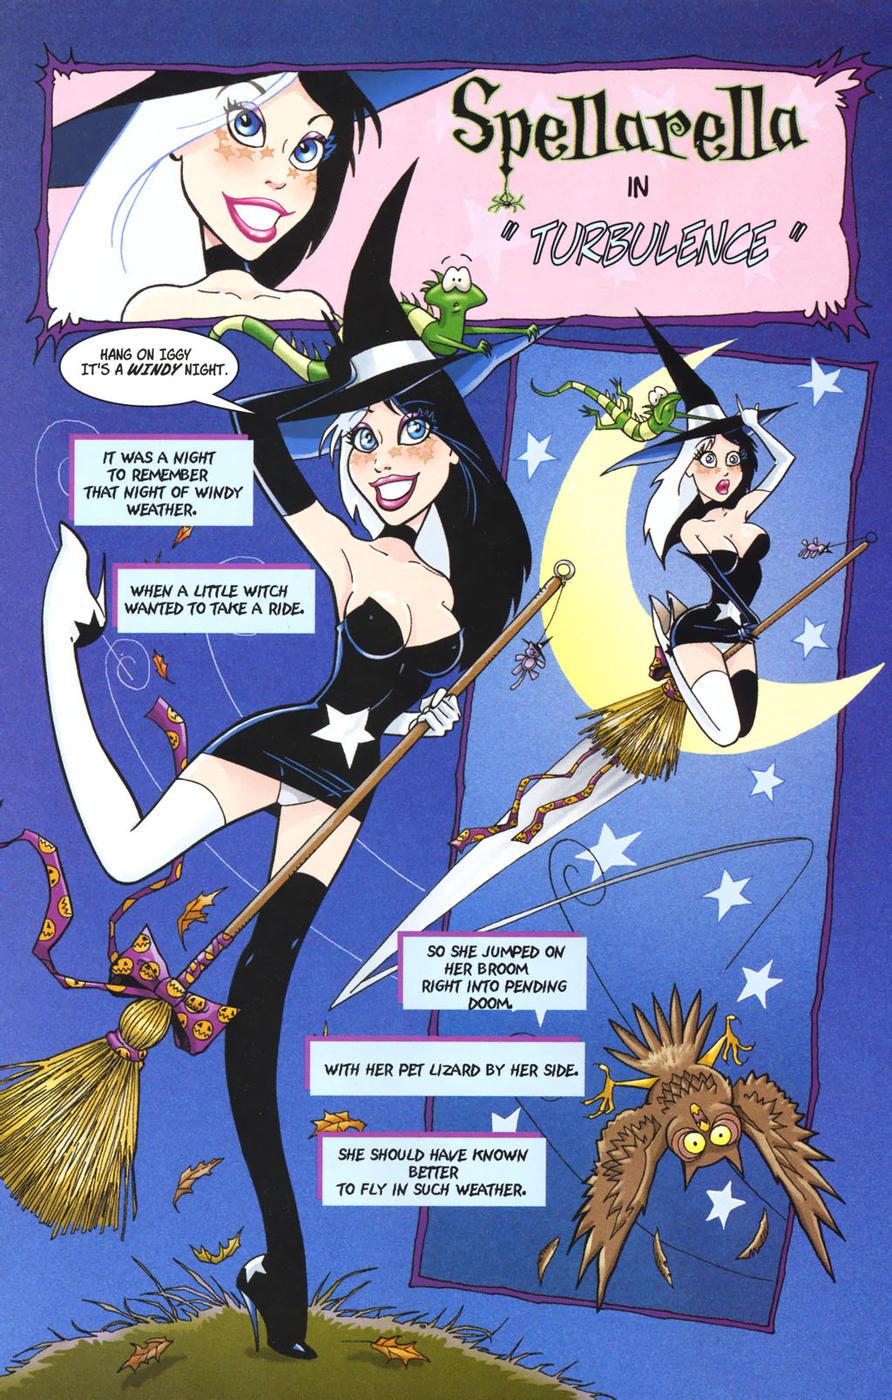 tarot nude rose the black witch of The road to el dorado gay